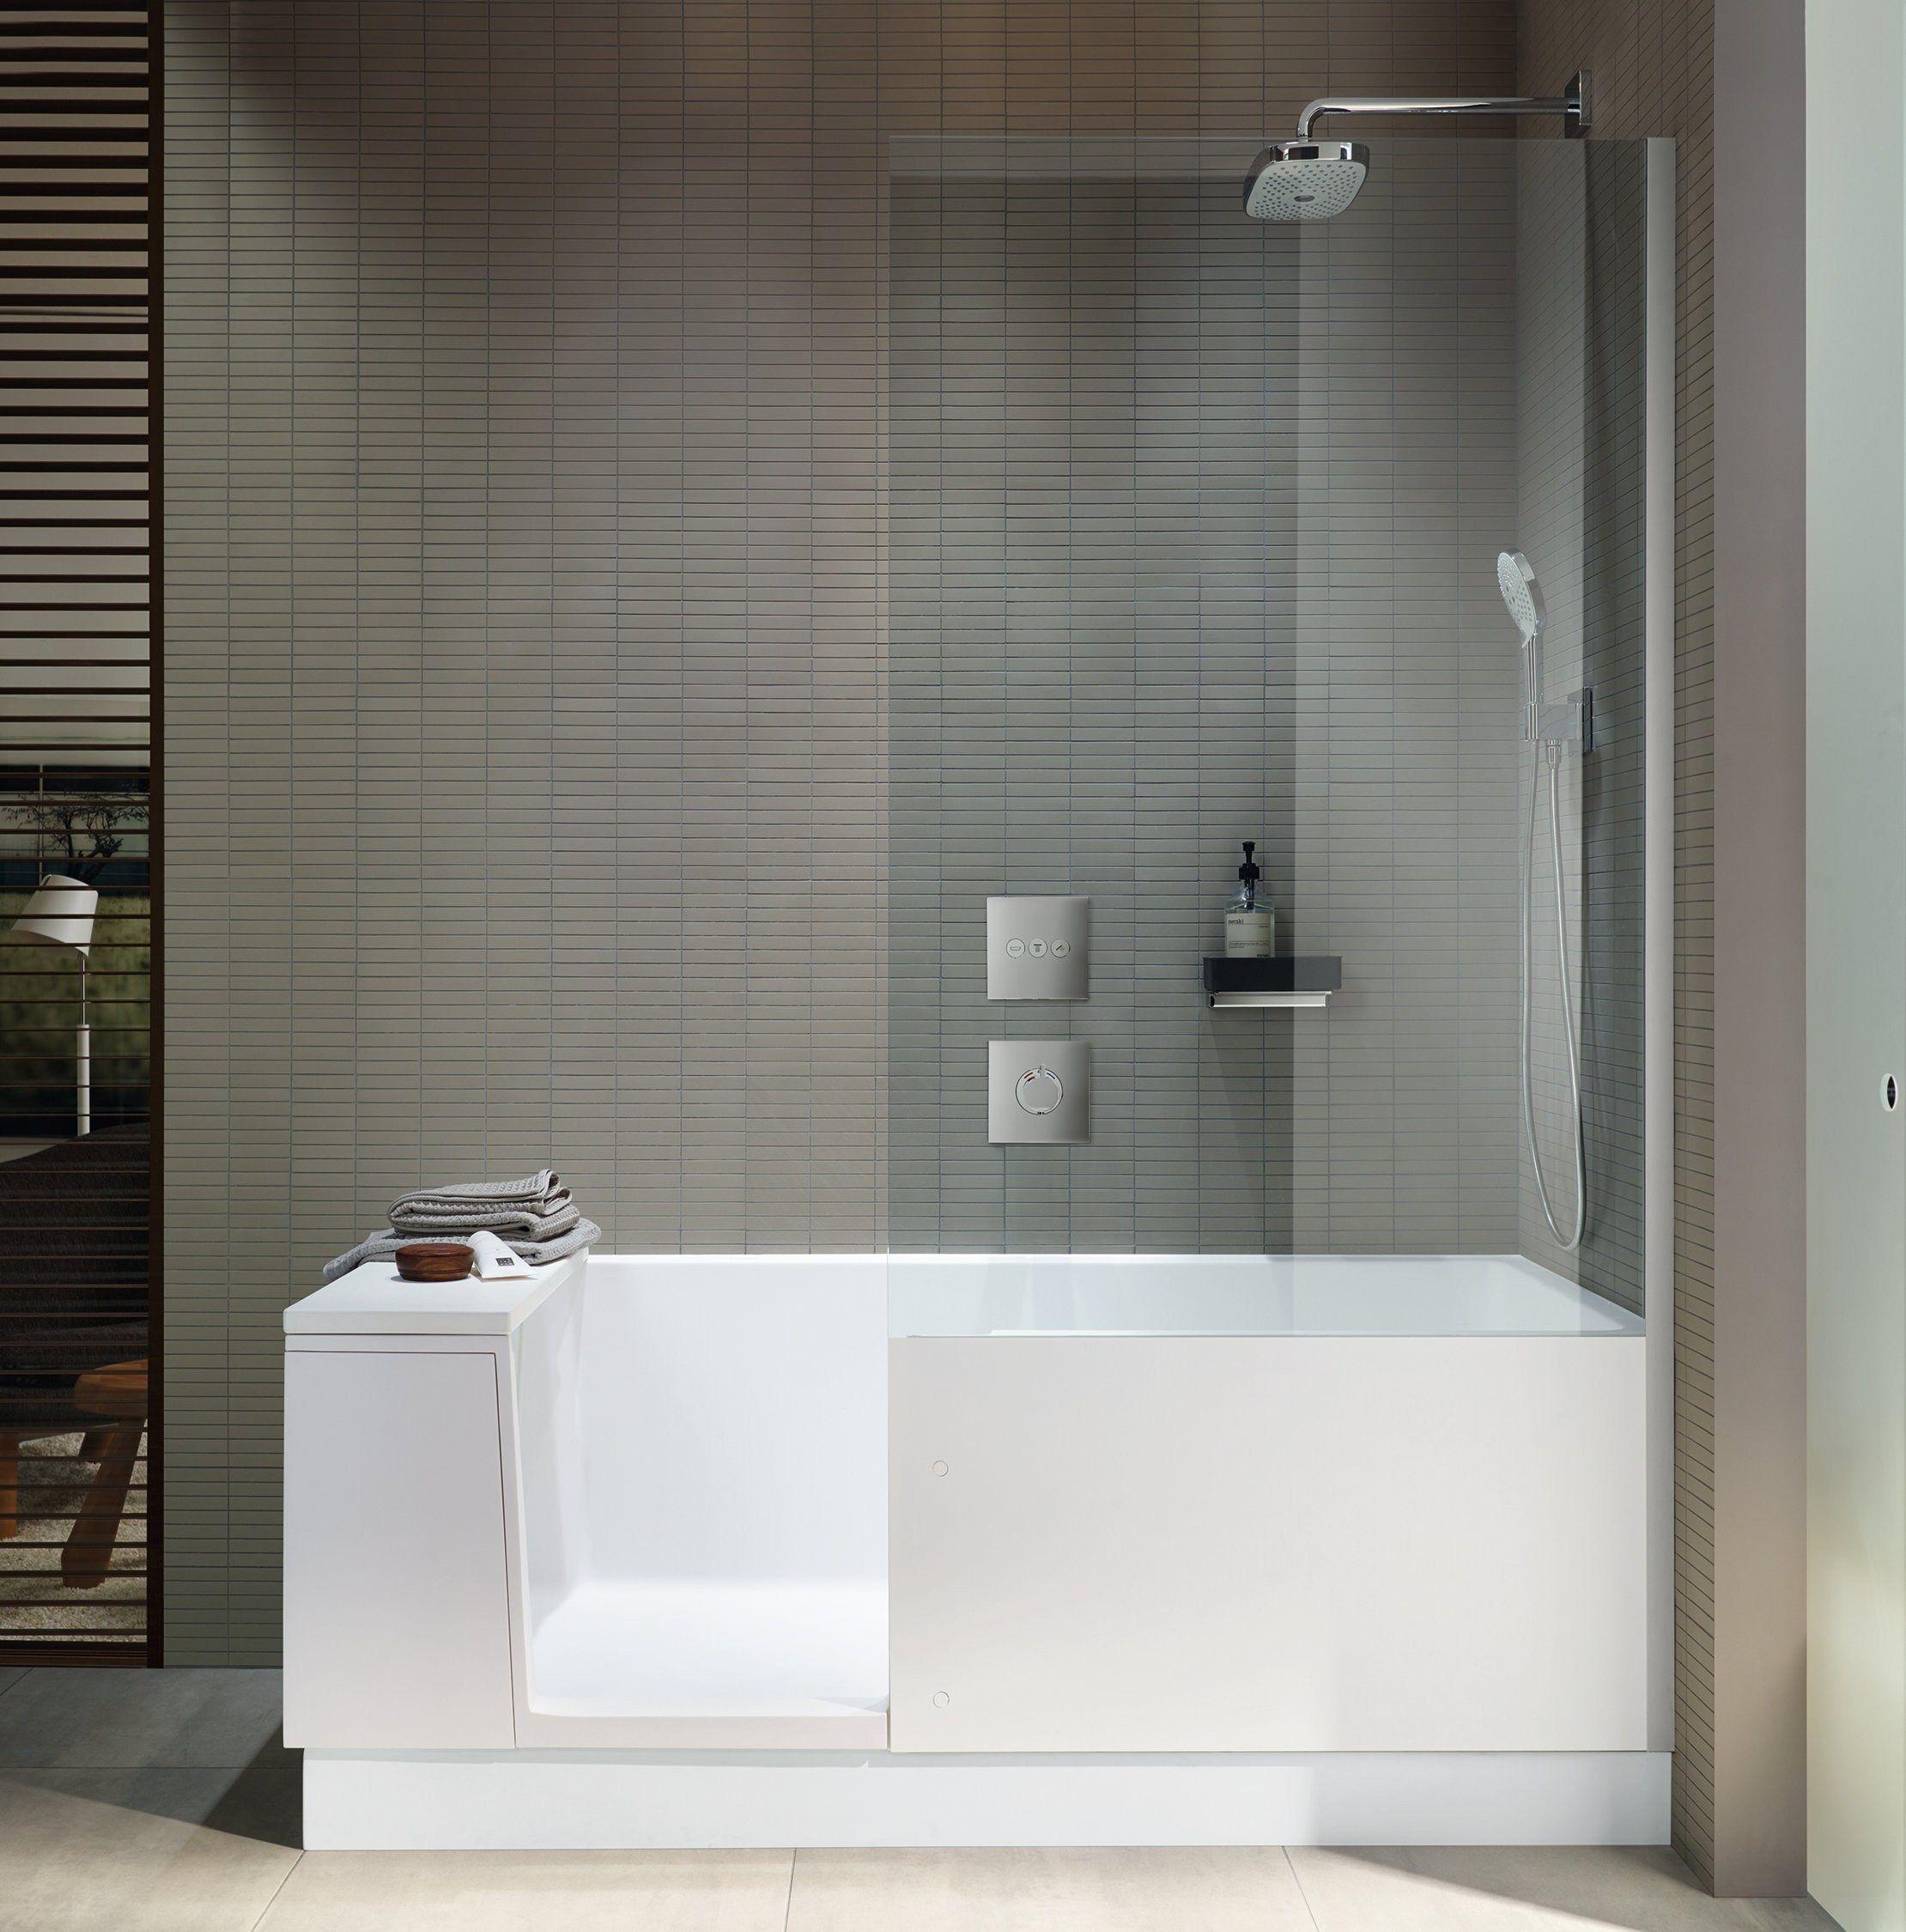 Vasca da bagno con doccia shower bath by duravit design eoos - Vasca da bagno duravit ...